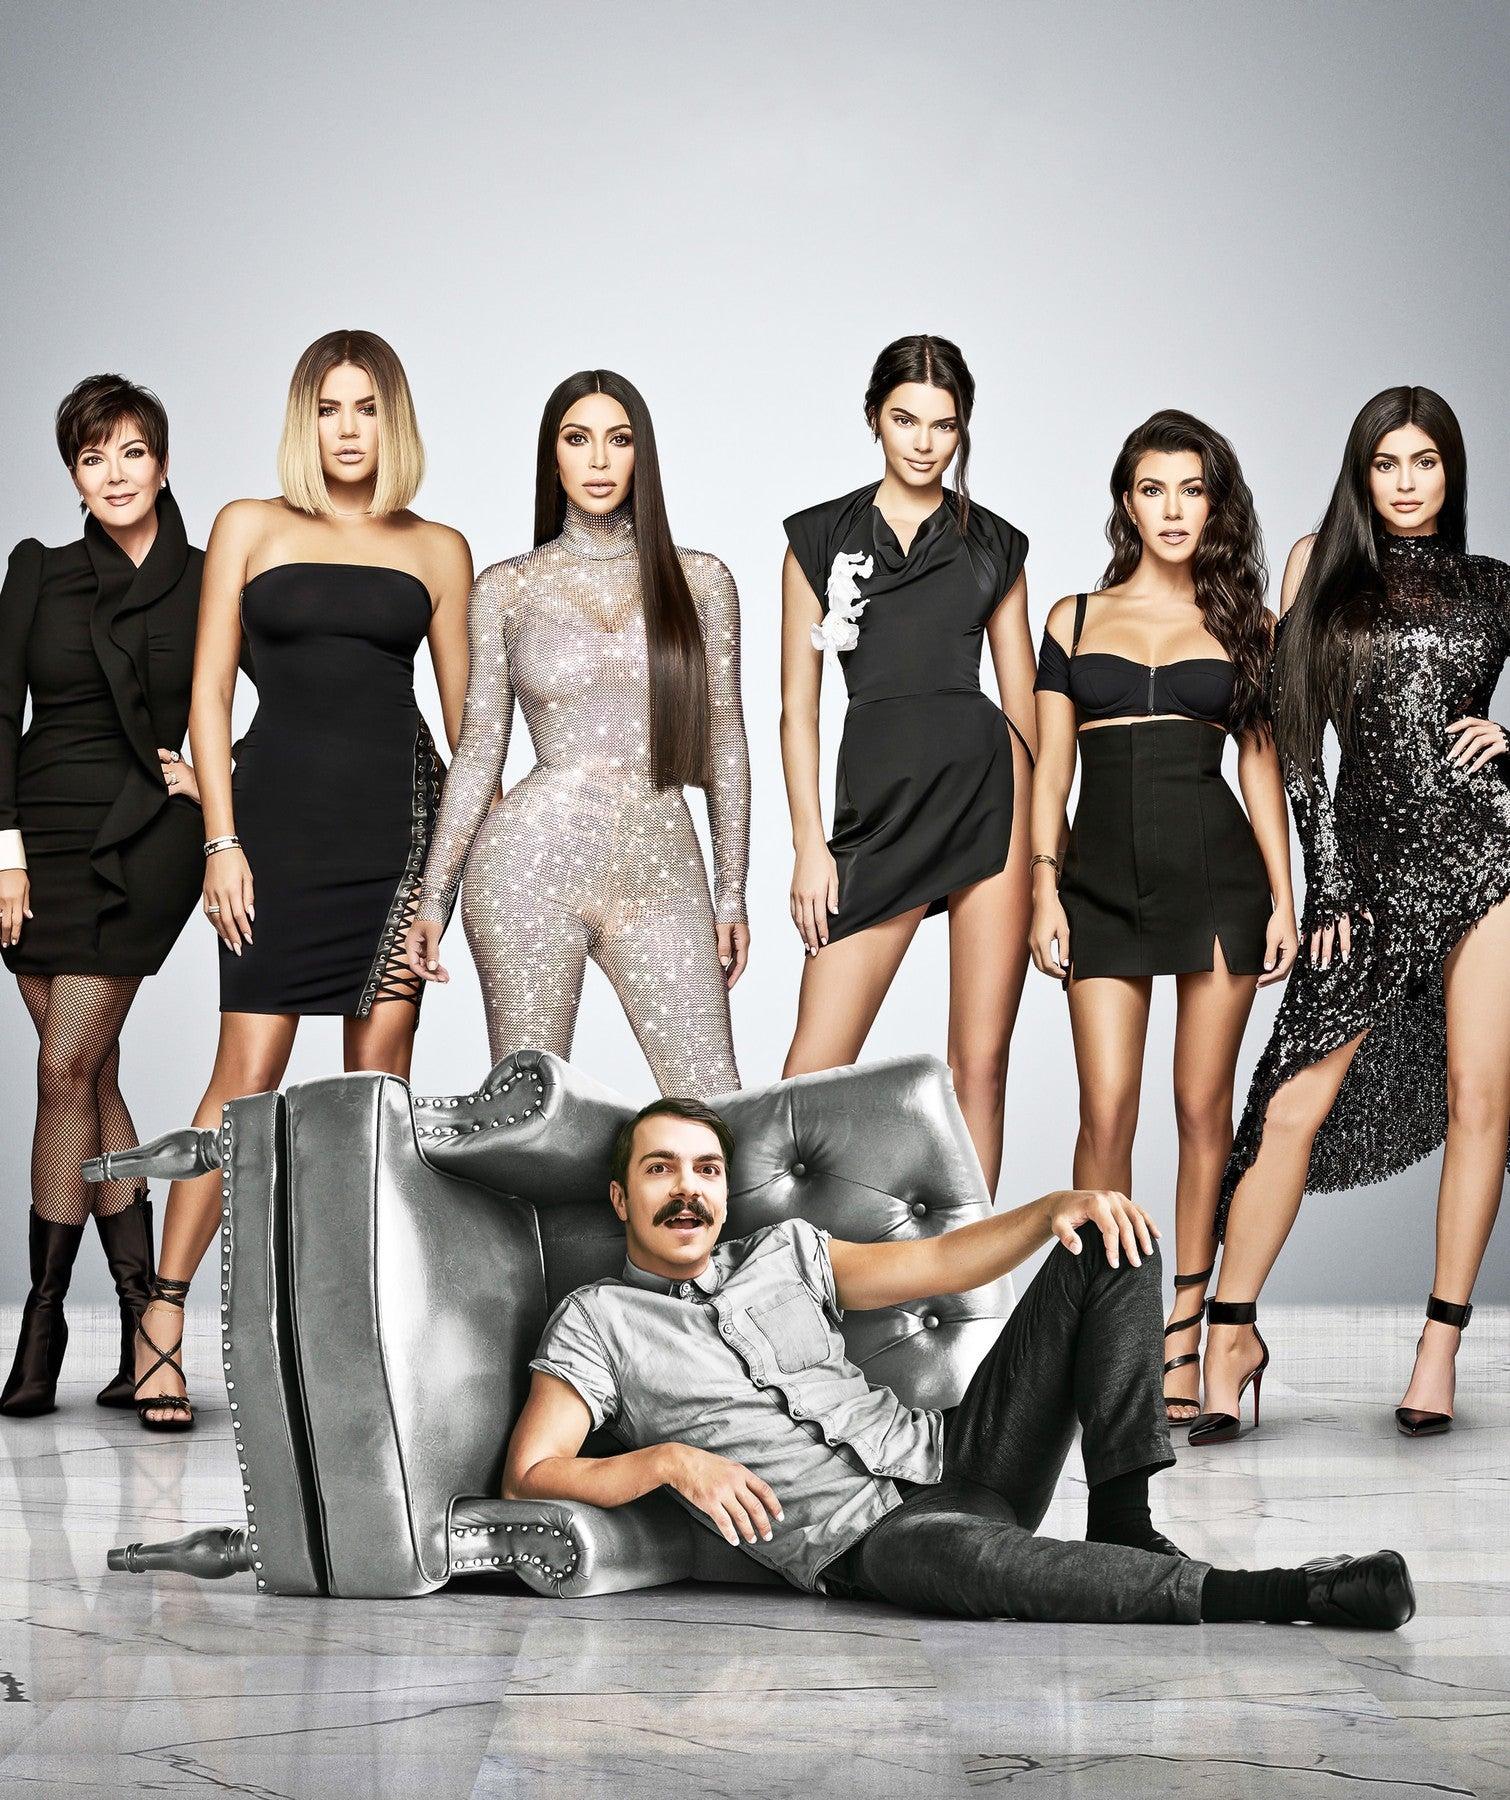 Promo fotka k nové TV show Kirby Jenner. Zleva: Kris Jenner, Khloé Kardashian, Kim Kardashian, Kendall Jenner, Kourtney Kardashian, Kylie Jenner a Kirby Jenner          Autor: Profimedia.cz